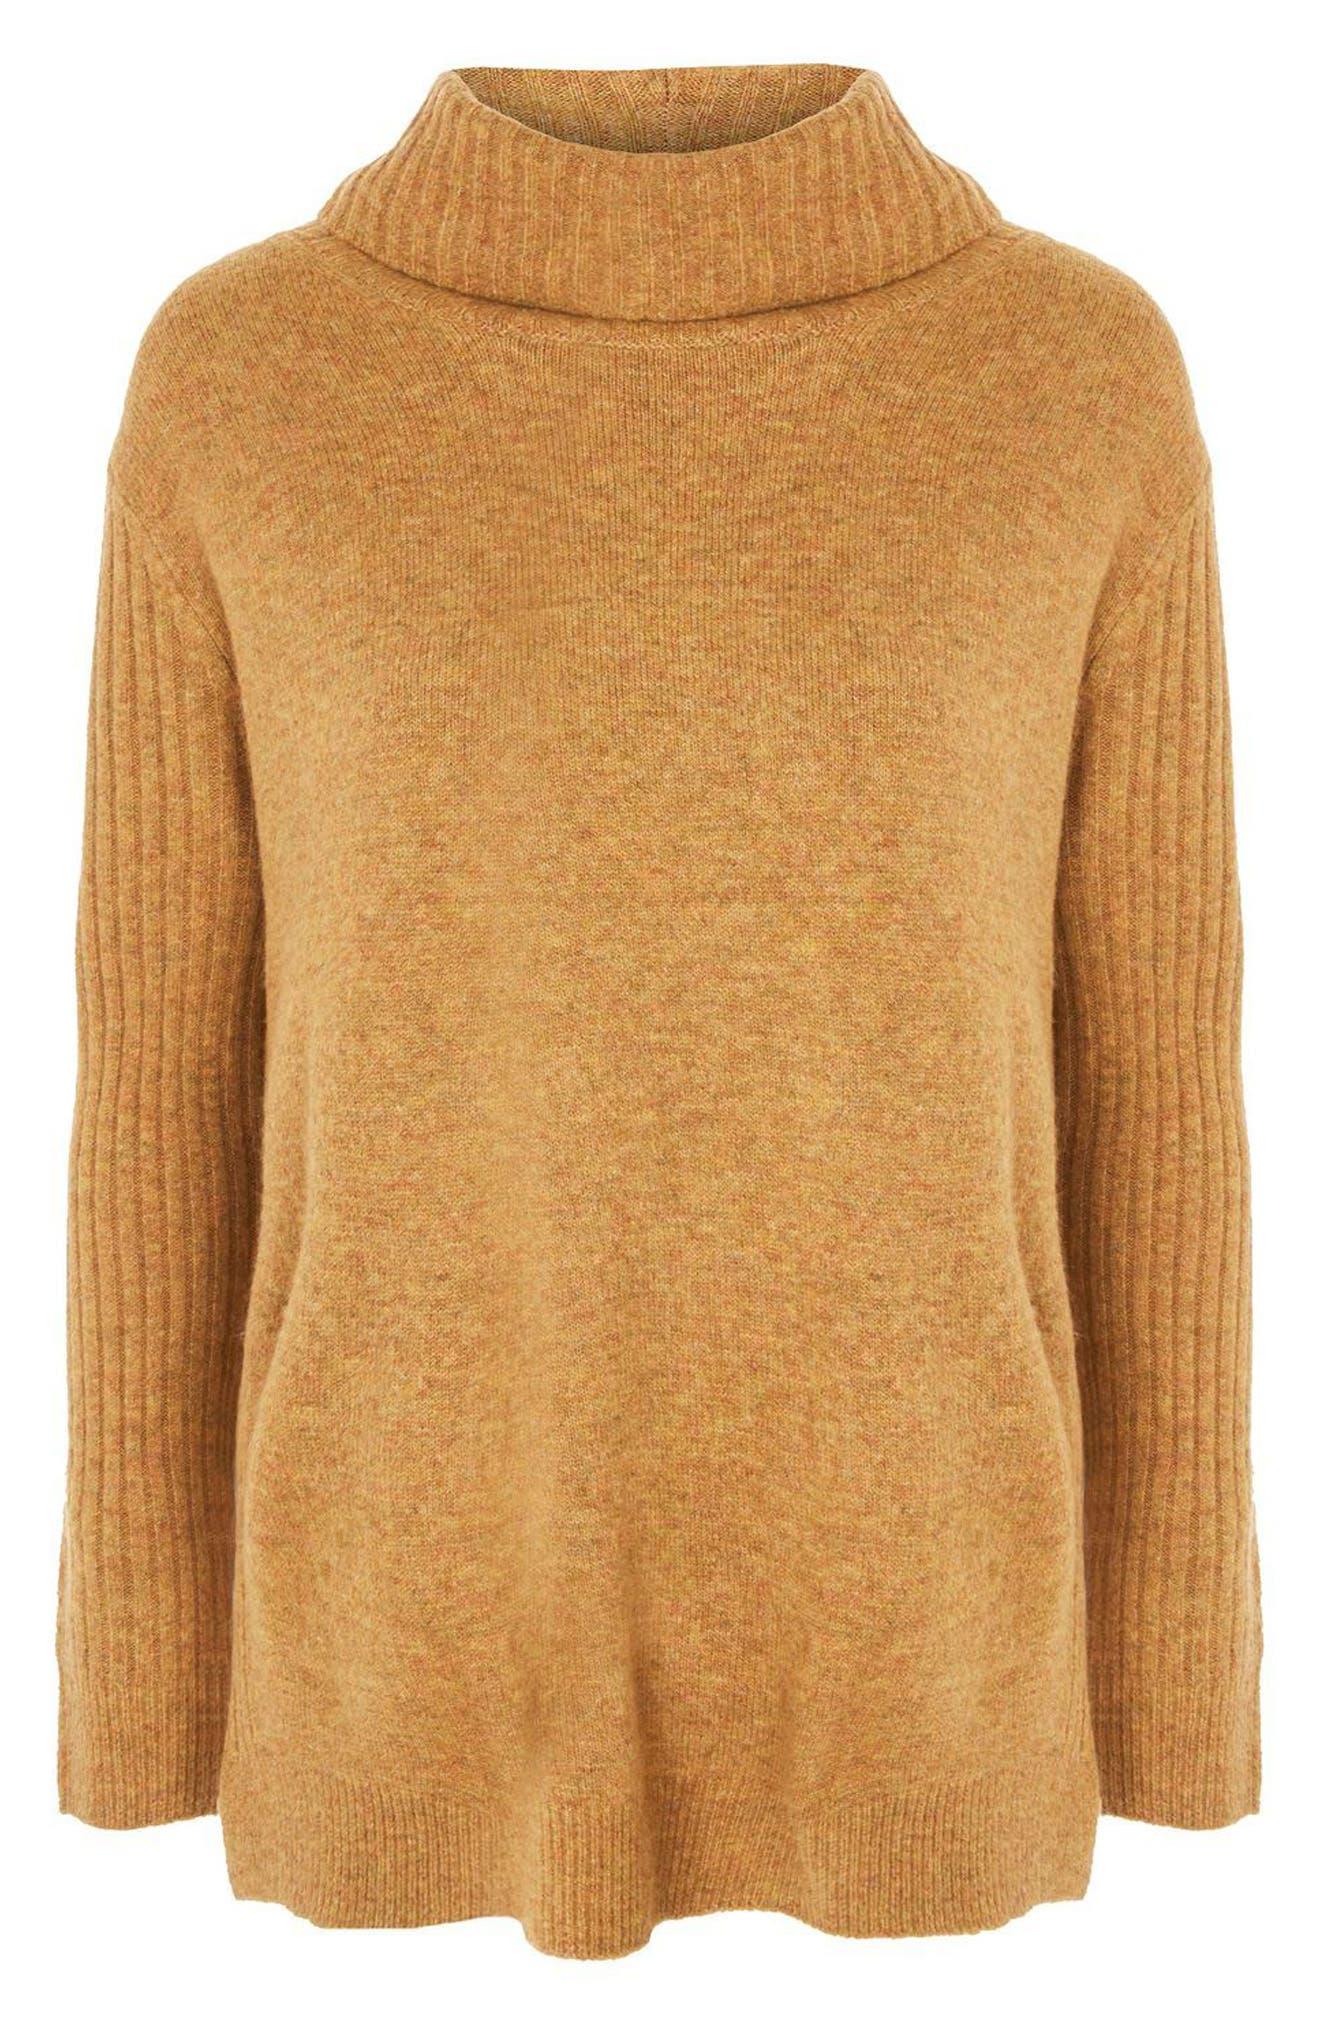 TOPSHOP, Oversize Turtleneck Sweater, Alternate thumbnail 2, color, 701